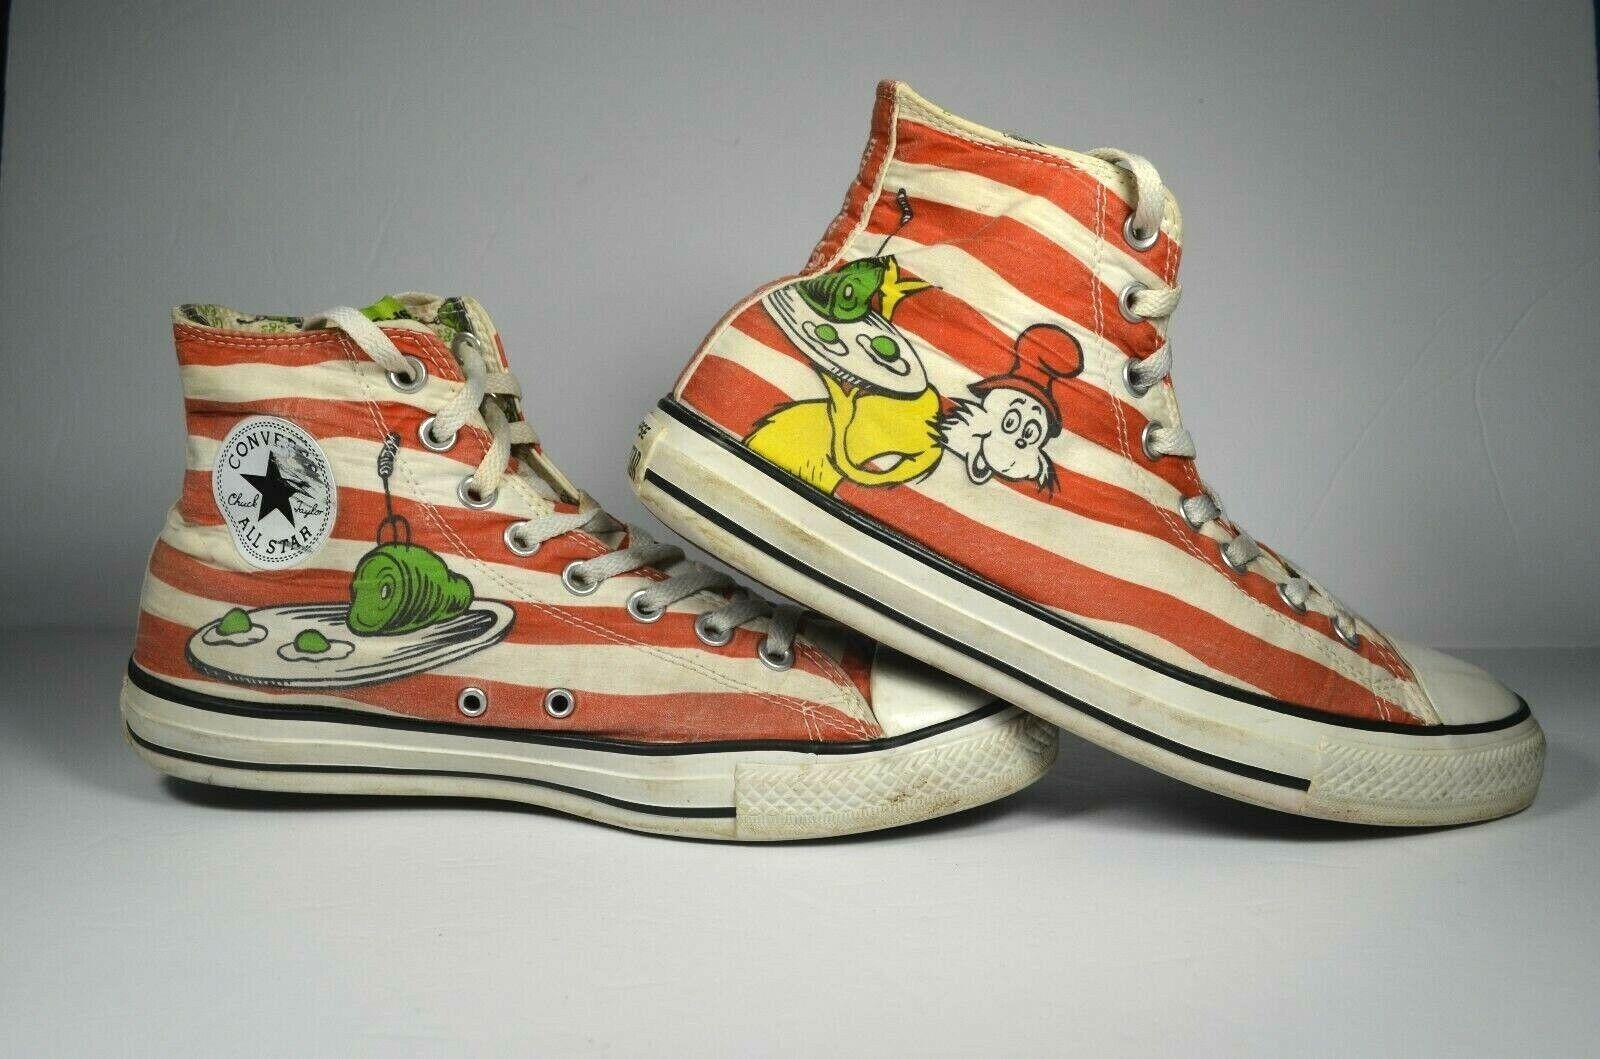 Converse All Star X Dr Seuss Seuss Seuss grön Eggs & Ham herr 9 Hi -Top skor  köp varumärke